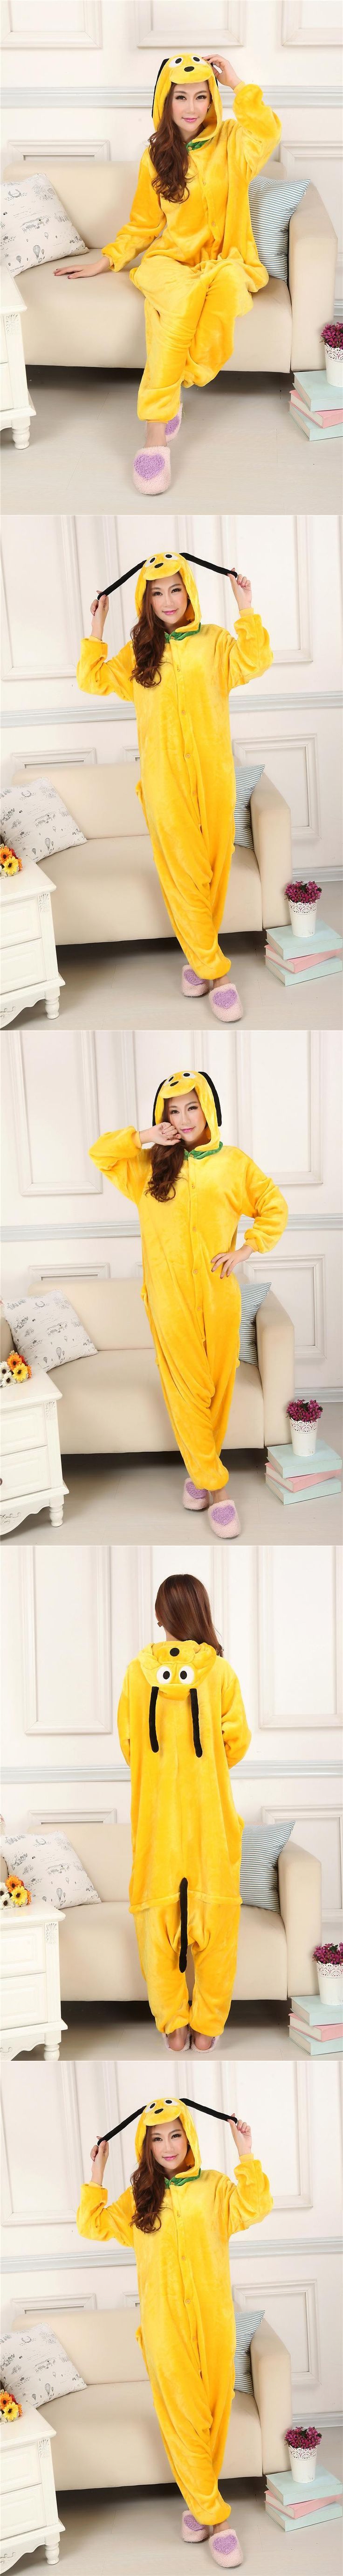 New Adult Animal Pluto Pajamas Set Sleepsuit Children Yellow Dog Onesies Sleepwear Unisex Pyjamas